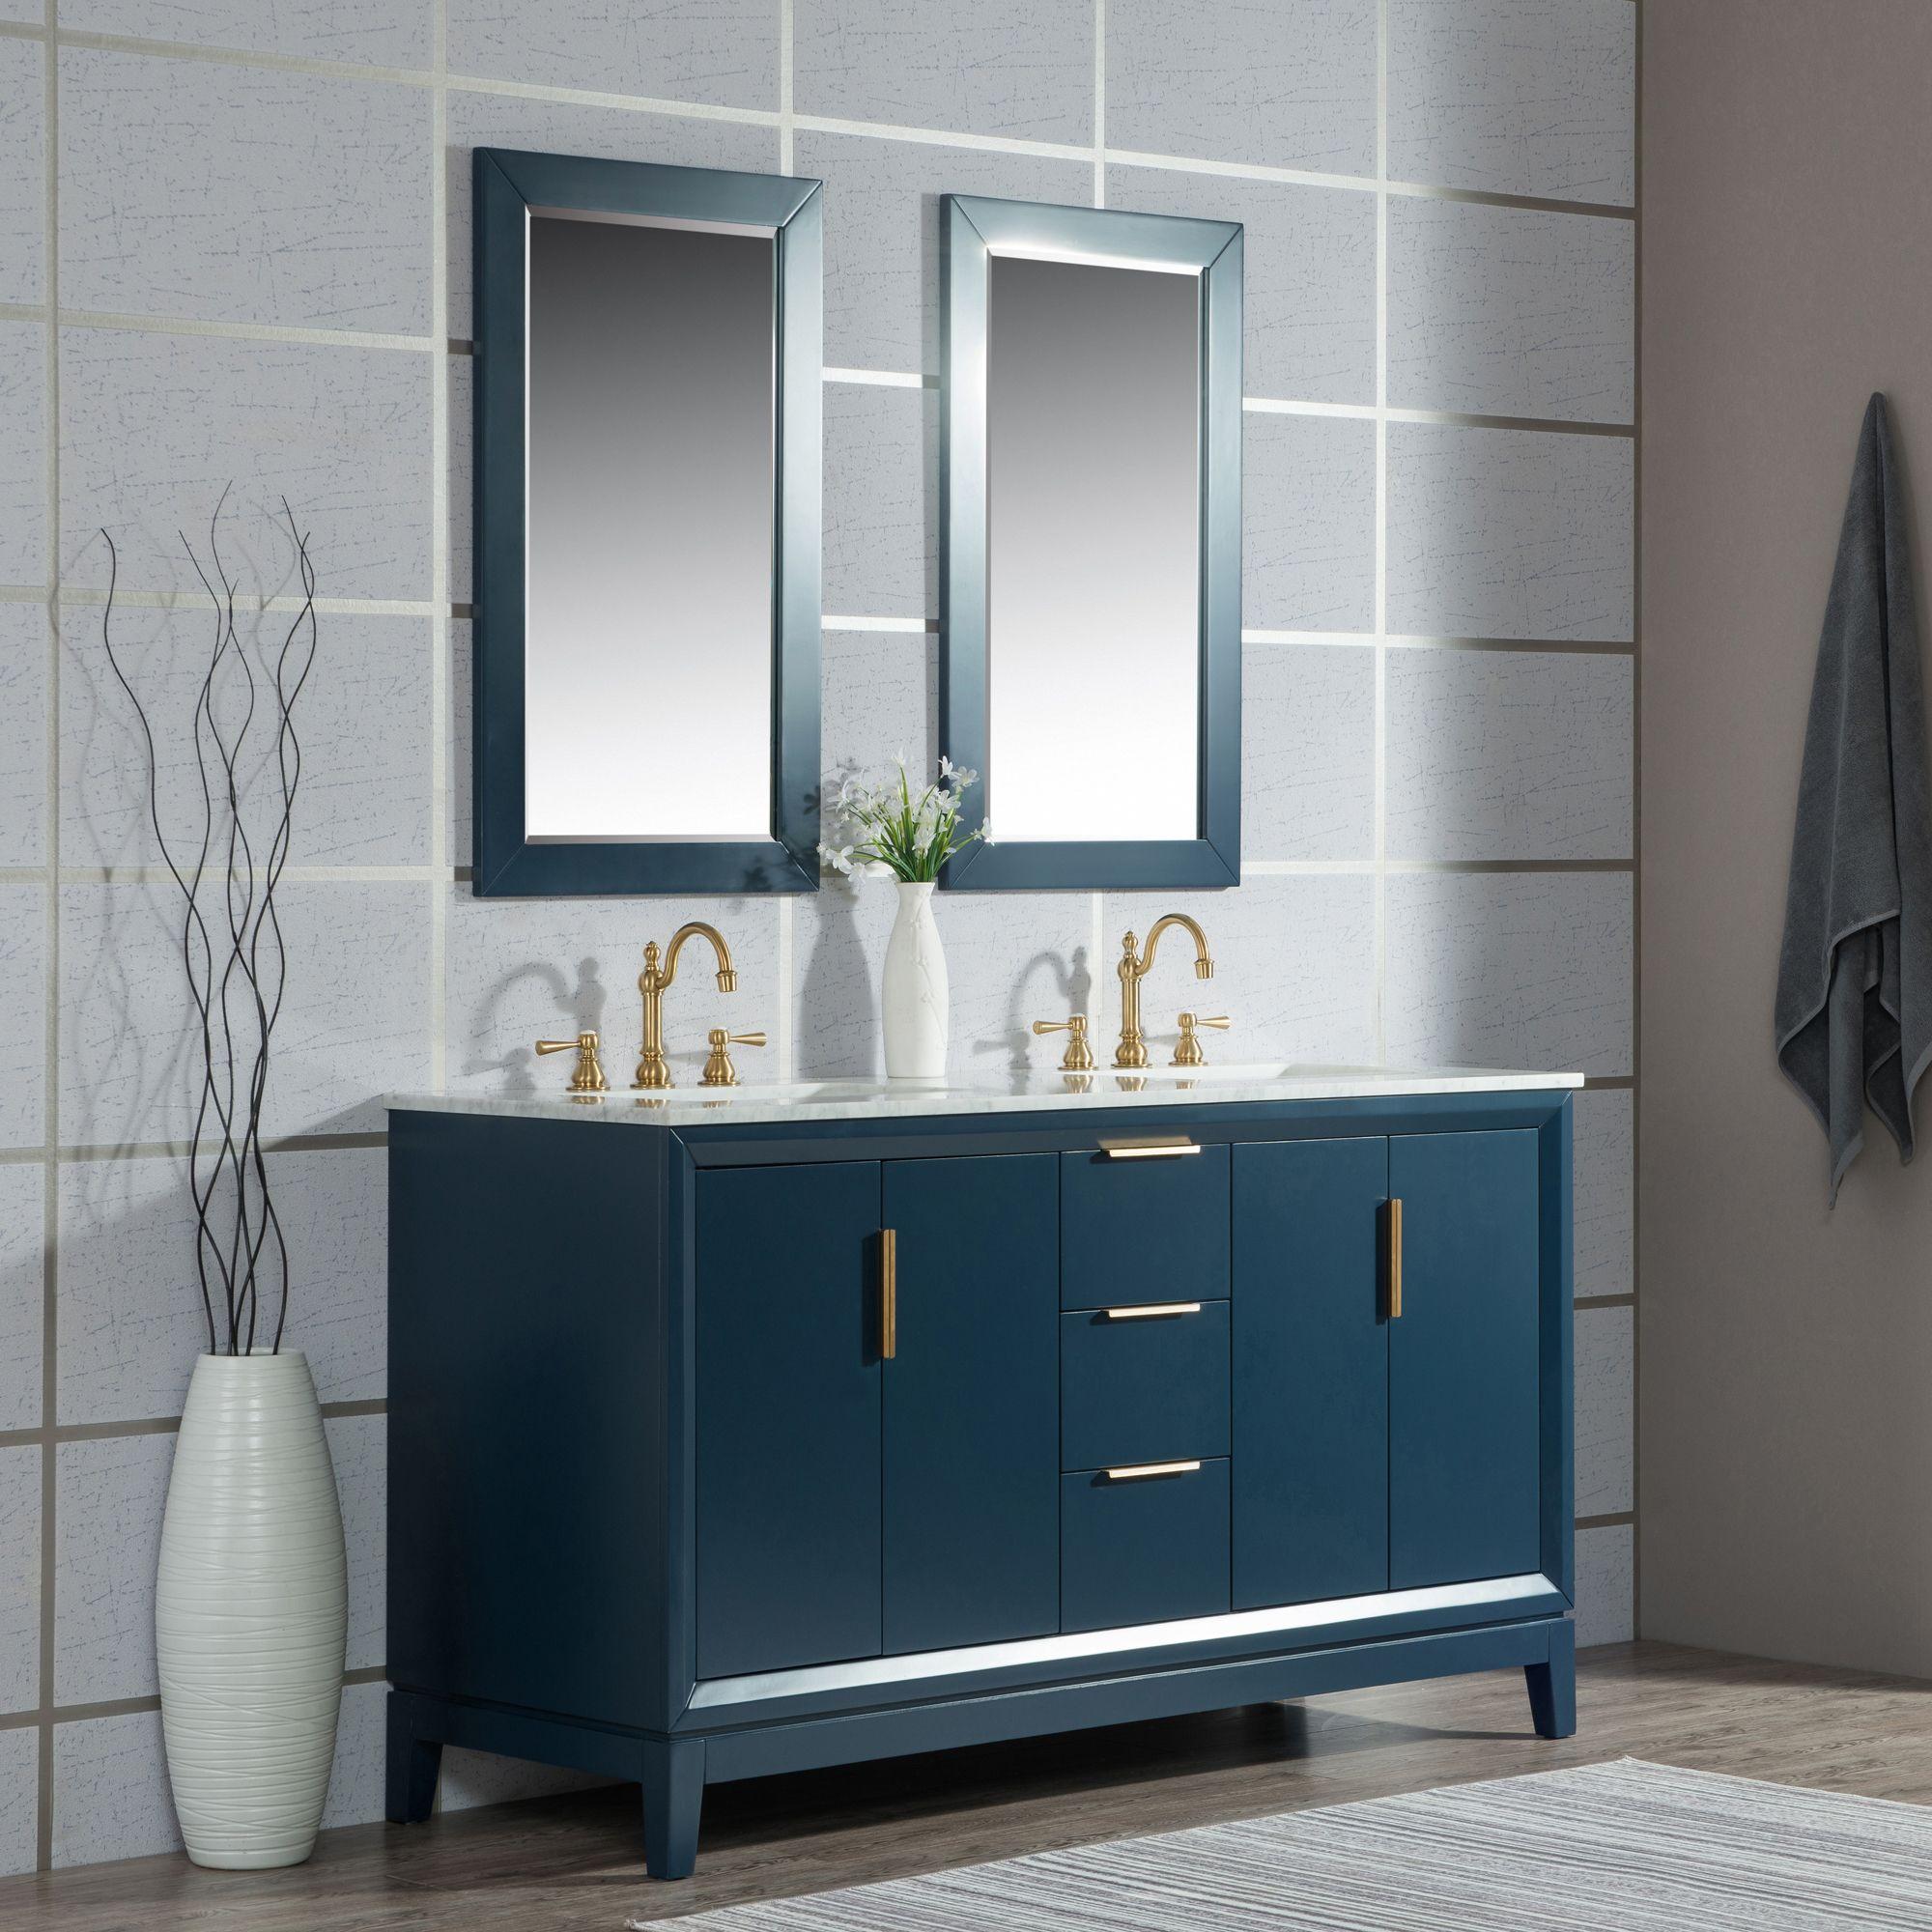 Elizabeth 60 Inch Double Sink Carrara White Marble Vanity In Monarch Blue Double Vanity Bathroom Blue Bathroom Vanity Marble Vanity Tops